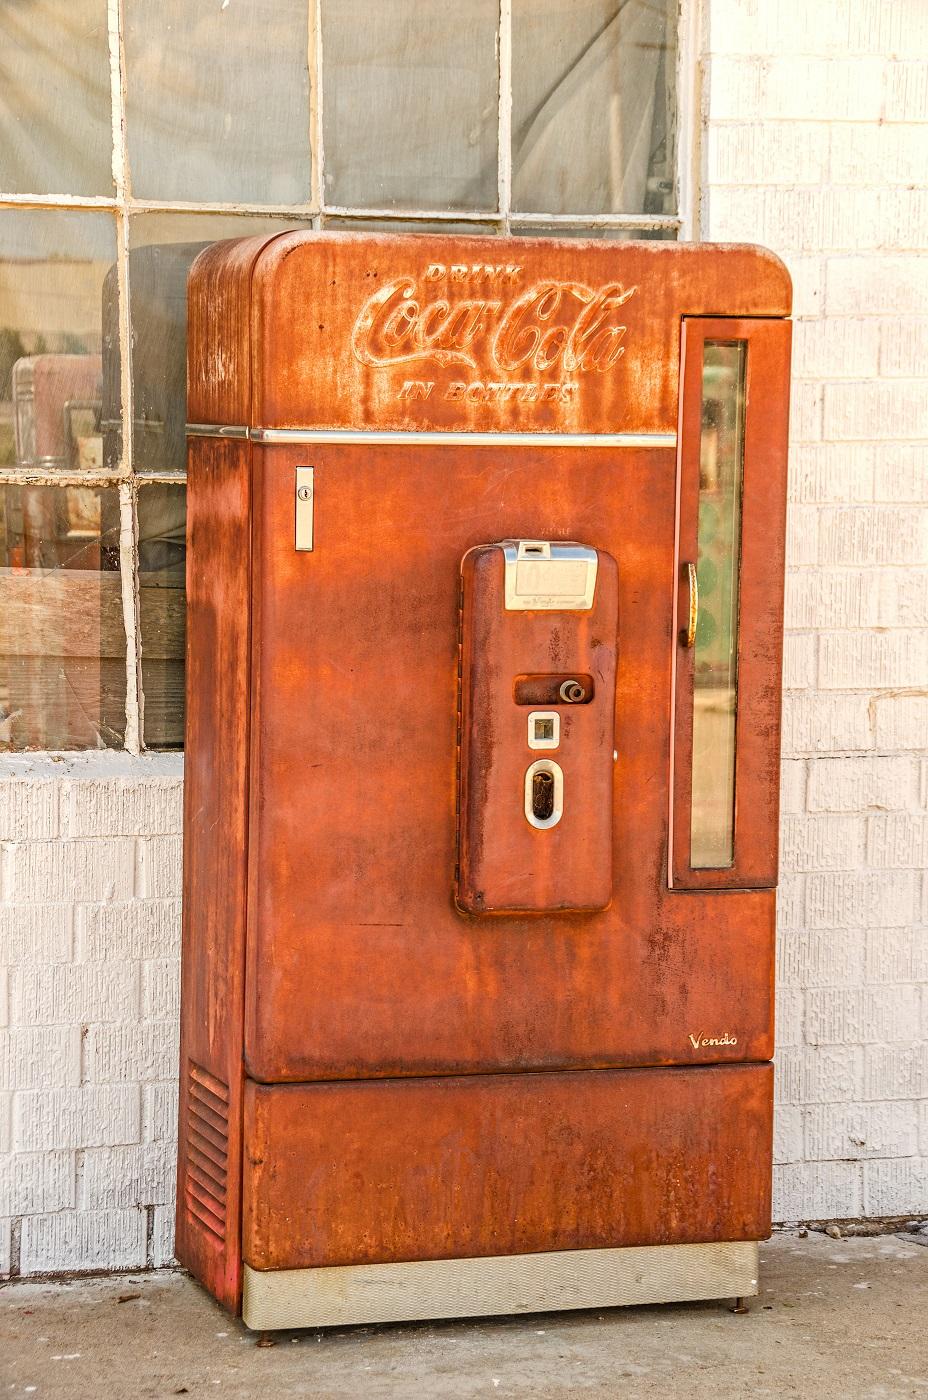 Alter Coca-Cola-Automat